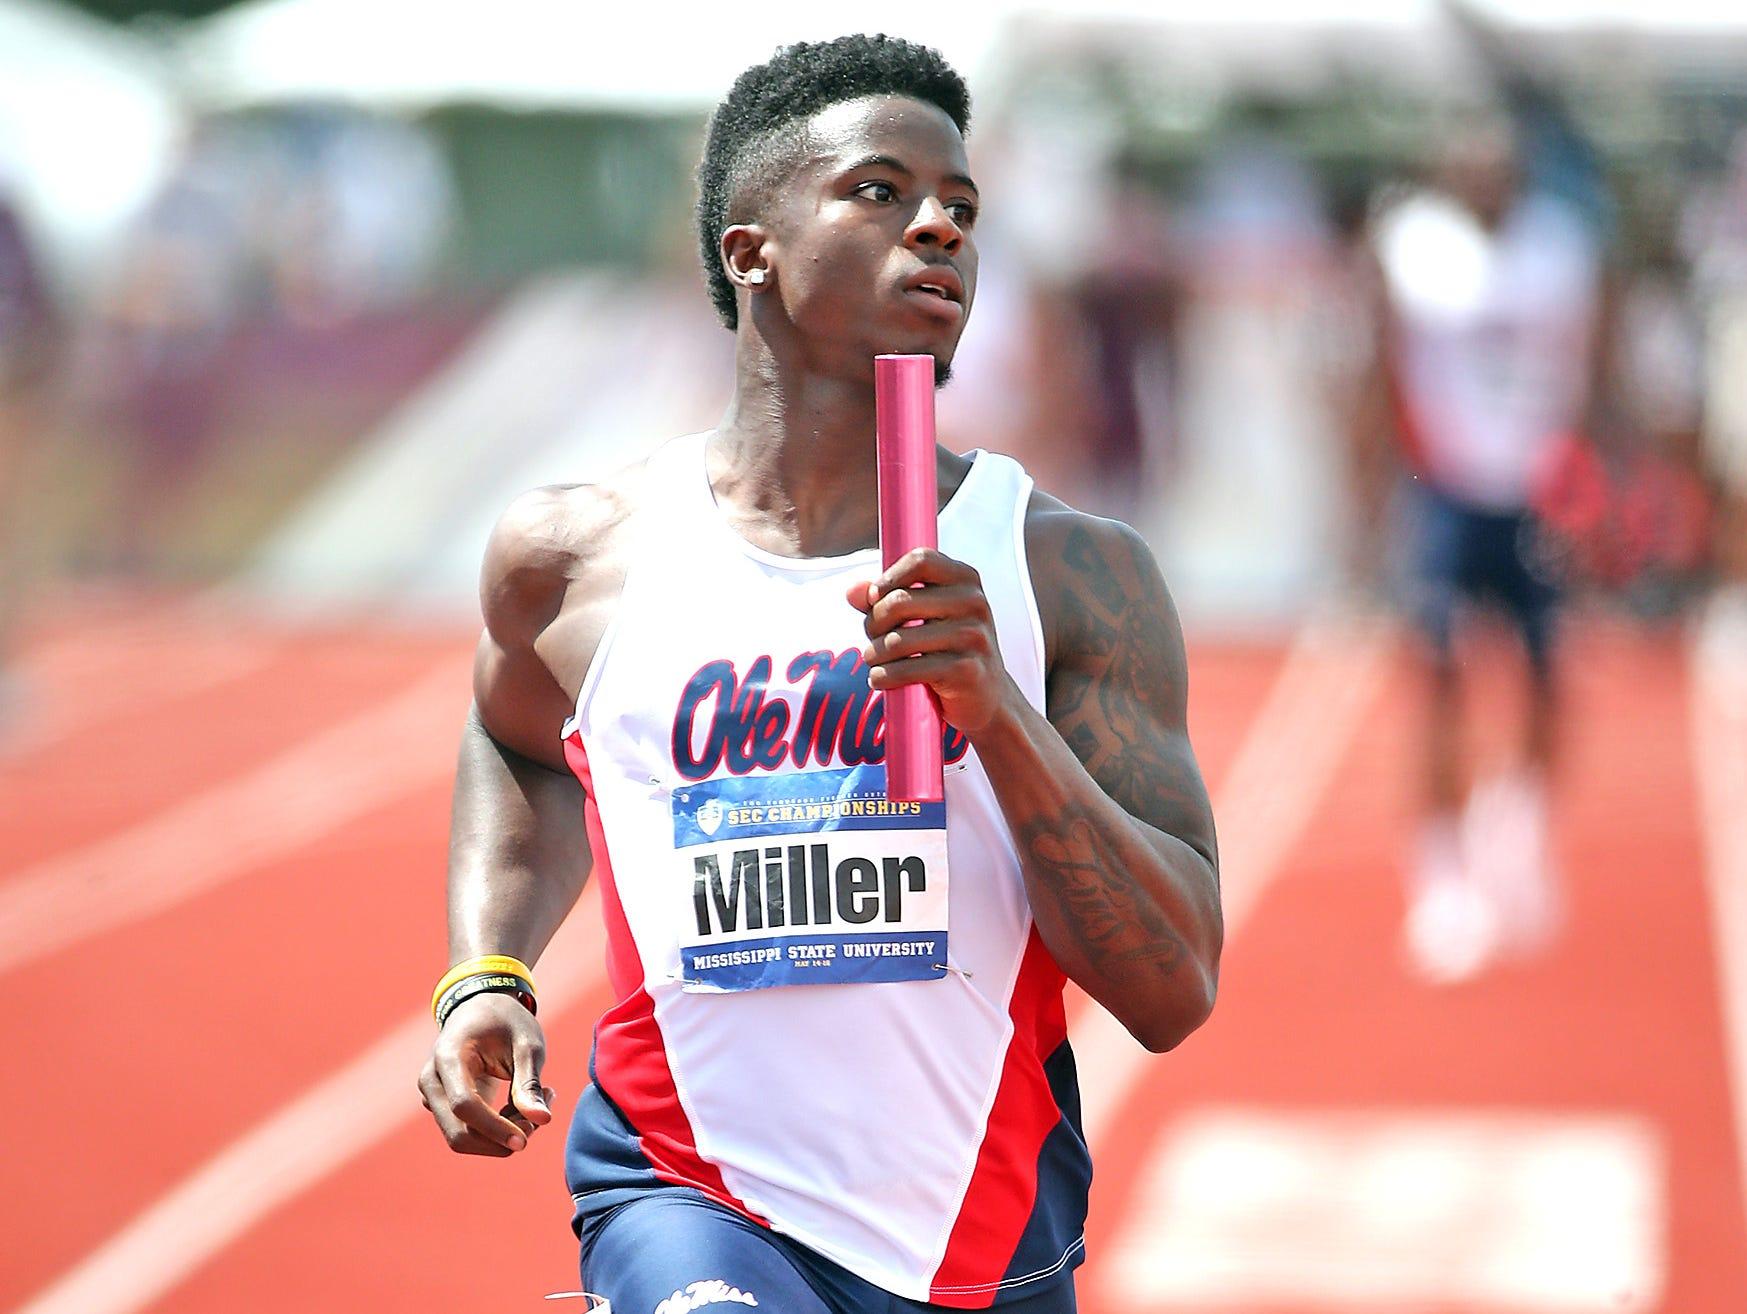 Jalen Miller runs at the SEC Outdoor Championships in Starkville, MS.